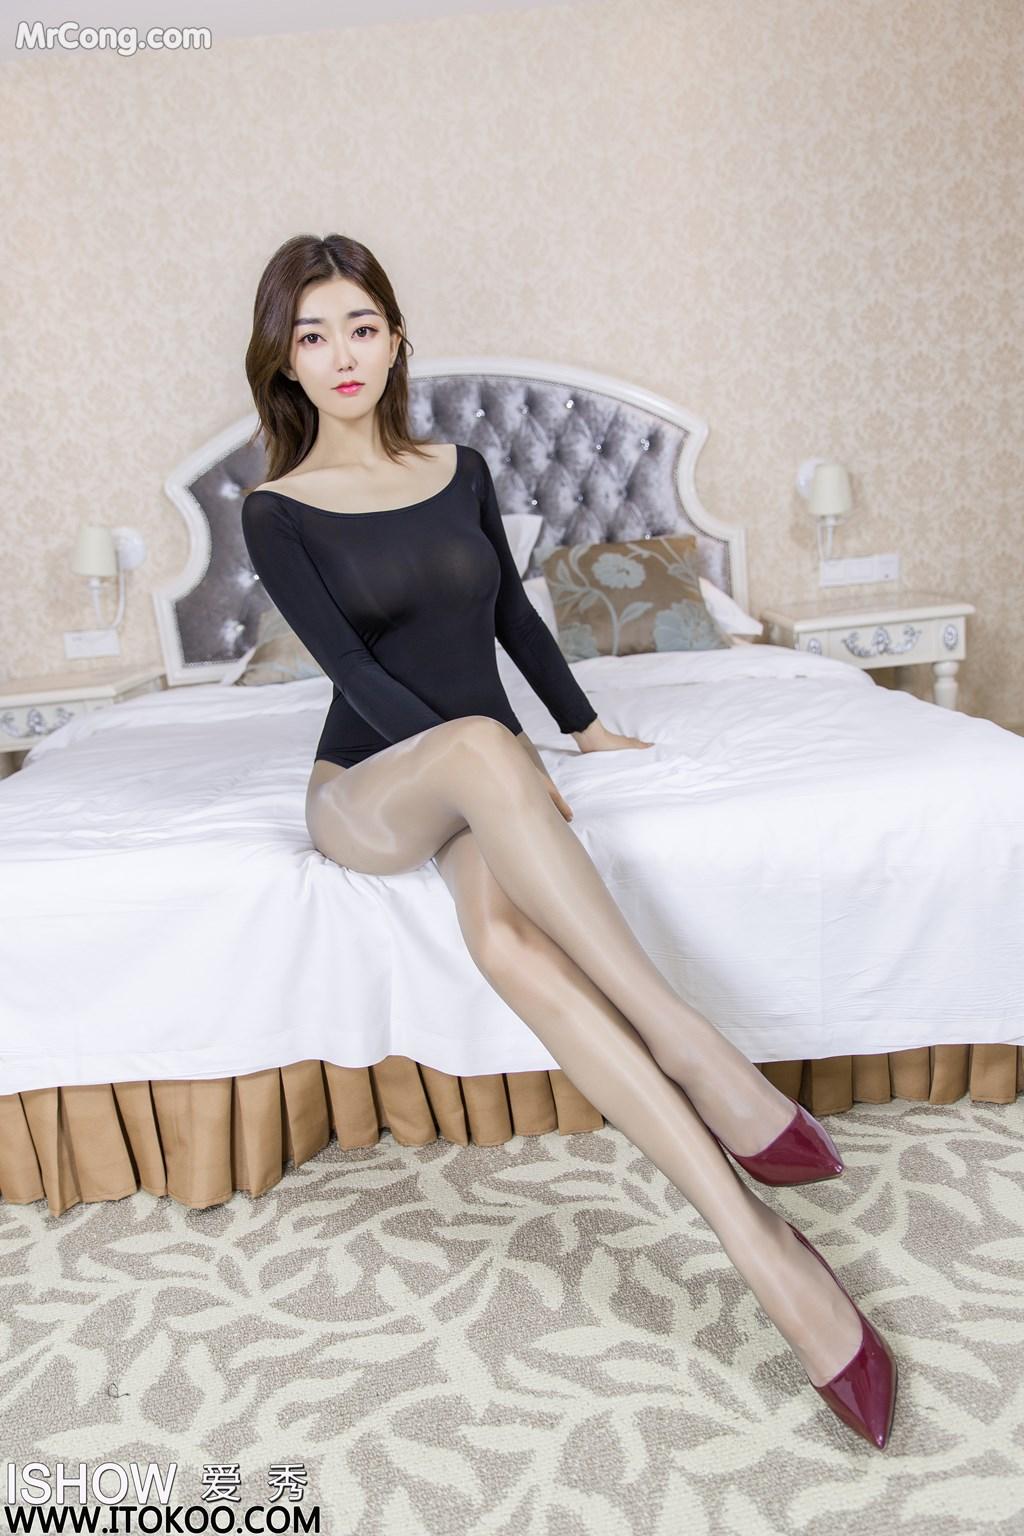 Image ISHOW-No.175-Caroline-MrCong.com-009 in post ISHOW No.175: Người mẫu 林琳Caroline (31 ảnh)